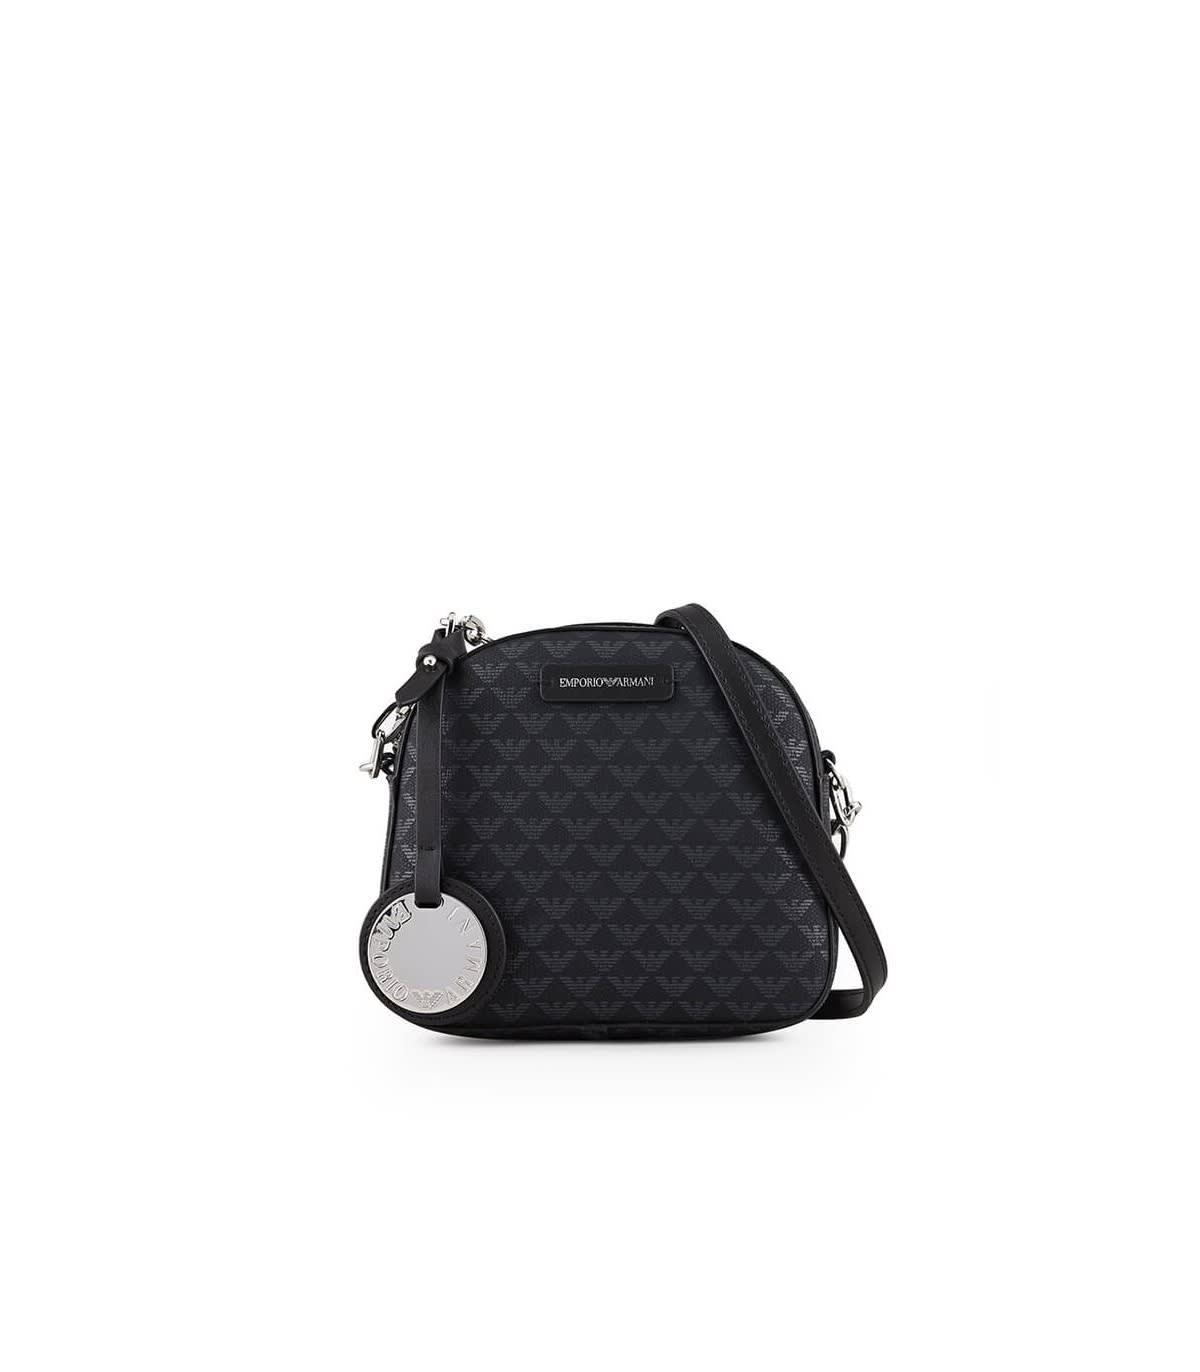 Emporio Armani Monogram Black Small Crossbody Bag